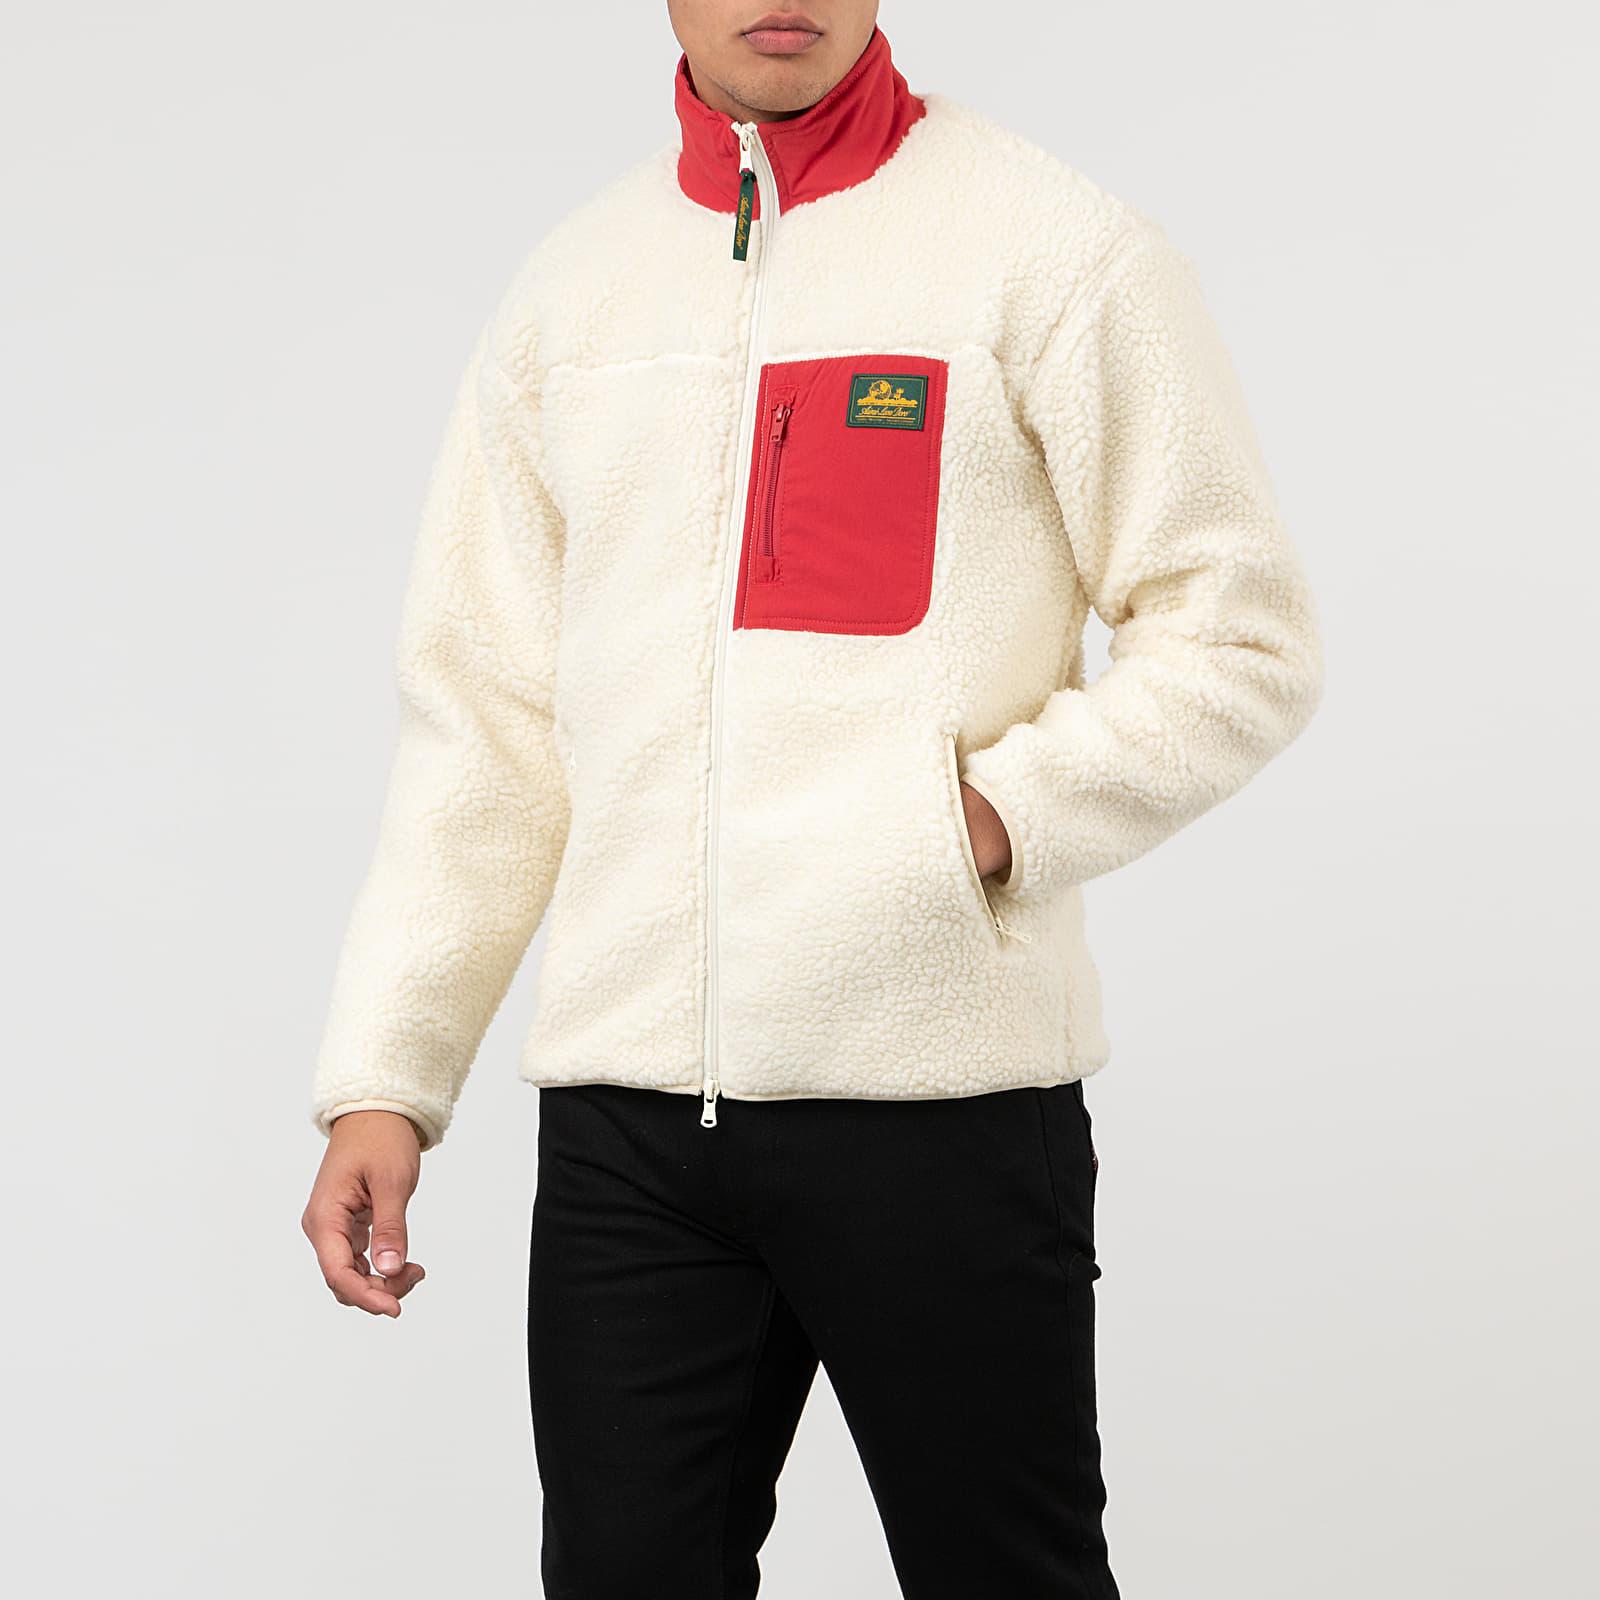 Aimé Leon Dore Full-Zip Polar Fleece Jacket